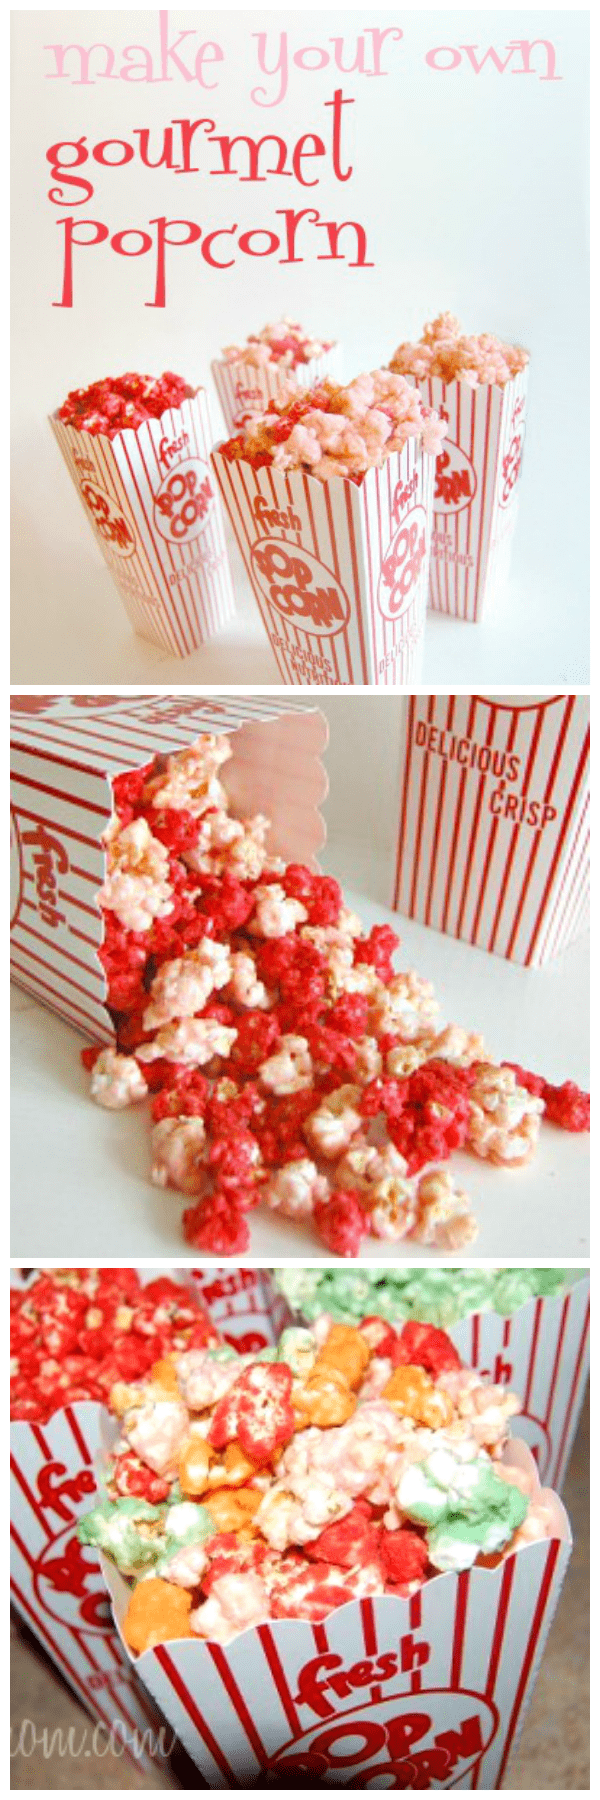 Gourmet Popcorn Easy DIY